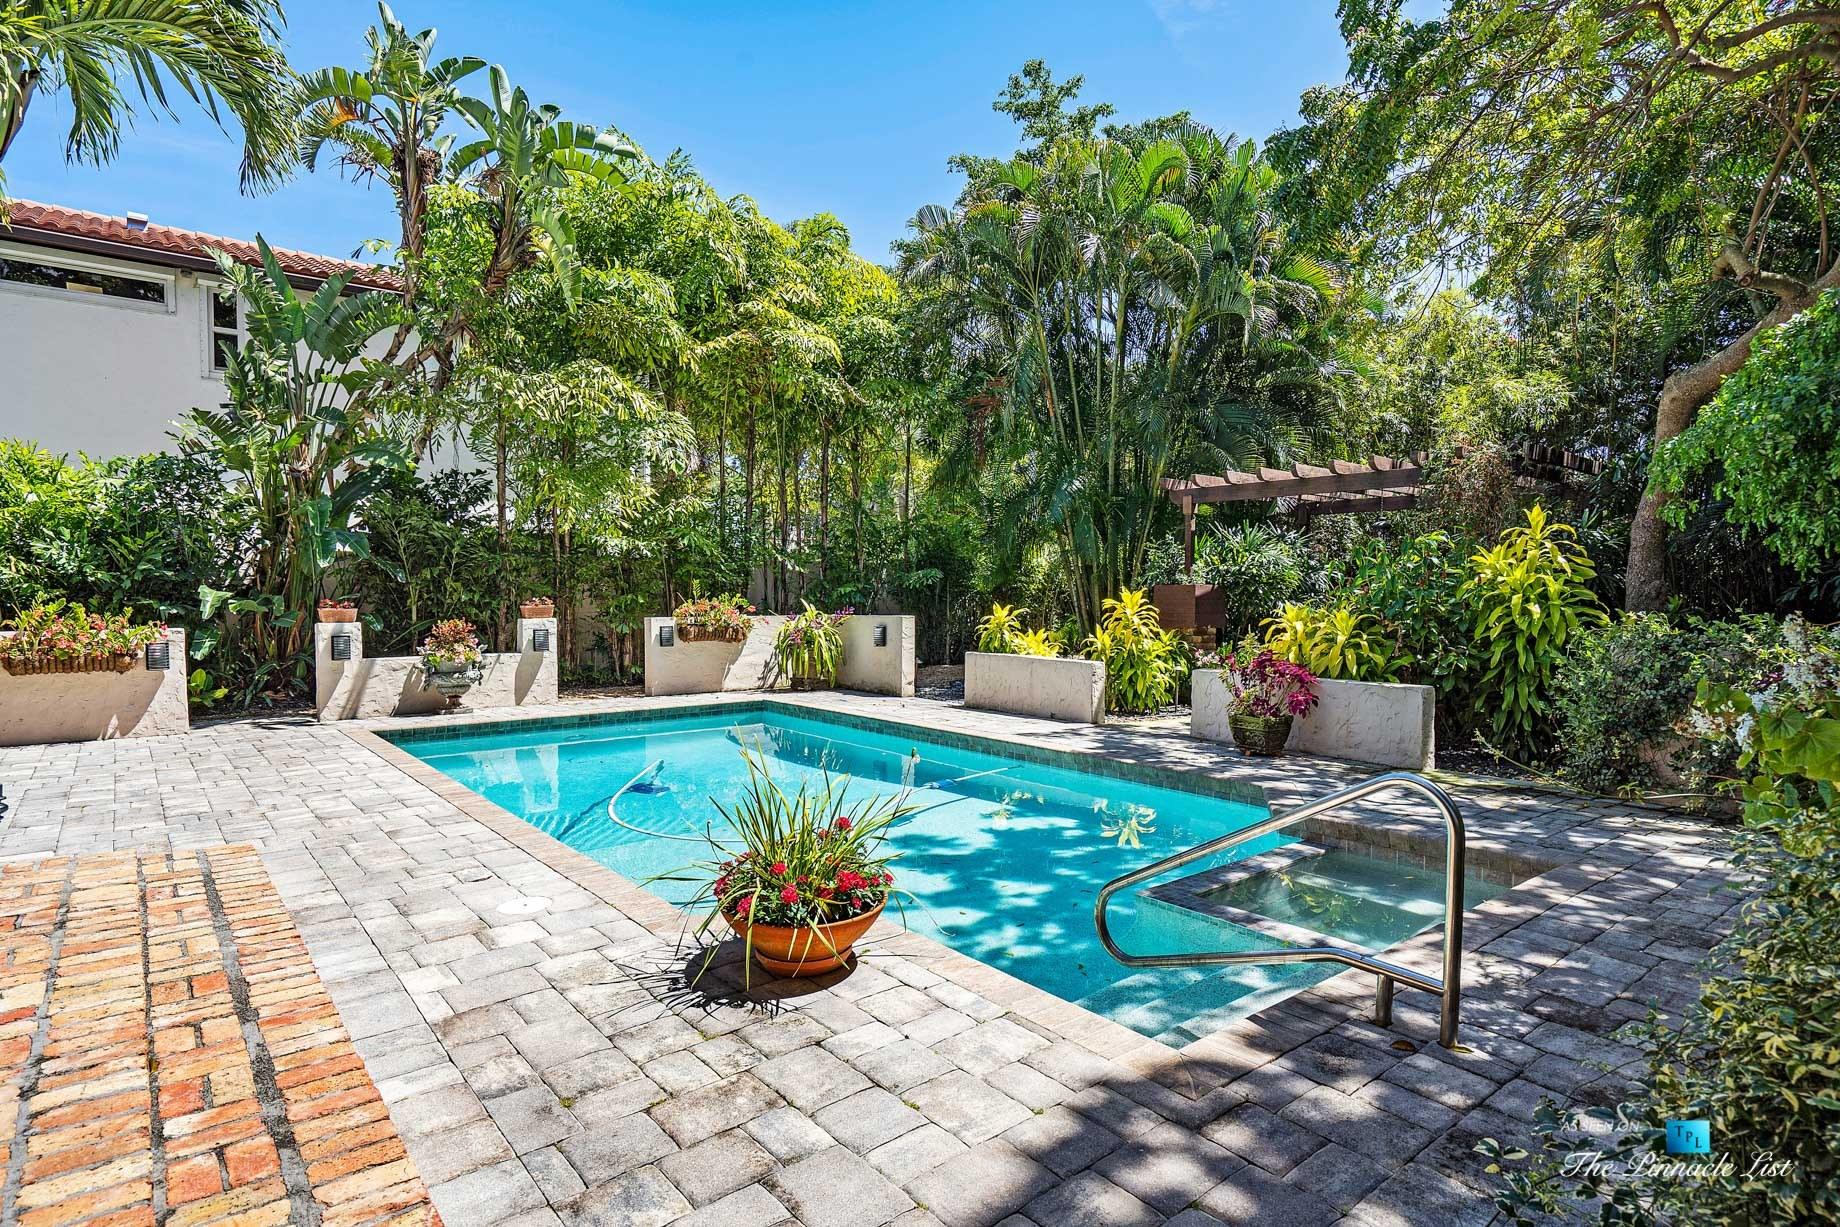 Addison Mizner Old Floresta Home – 888 Oleander St, Boca Raton, FL, USA – Outdoor Pool